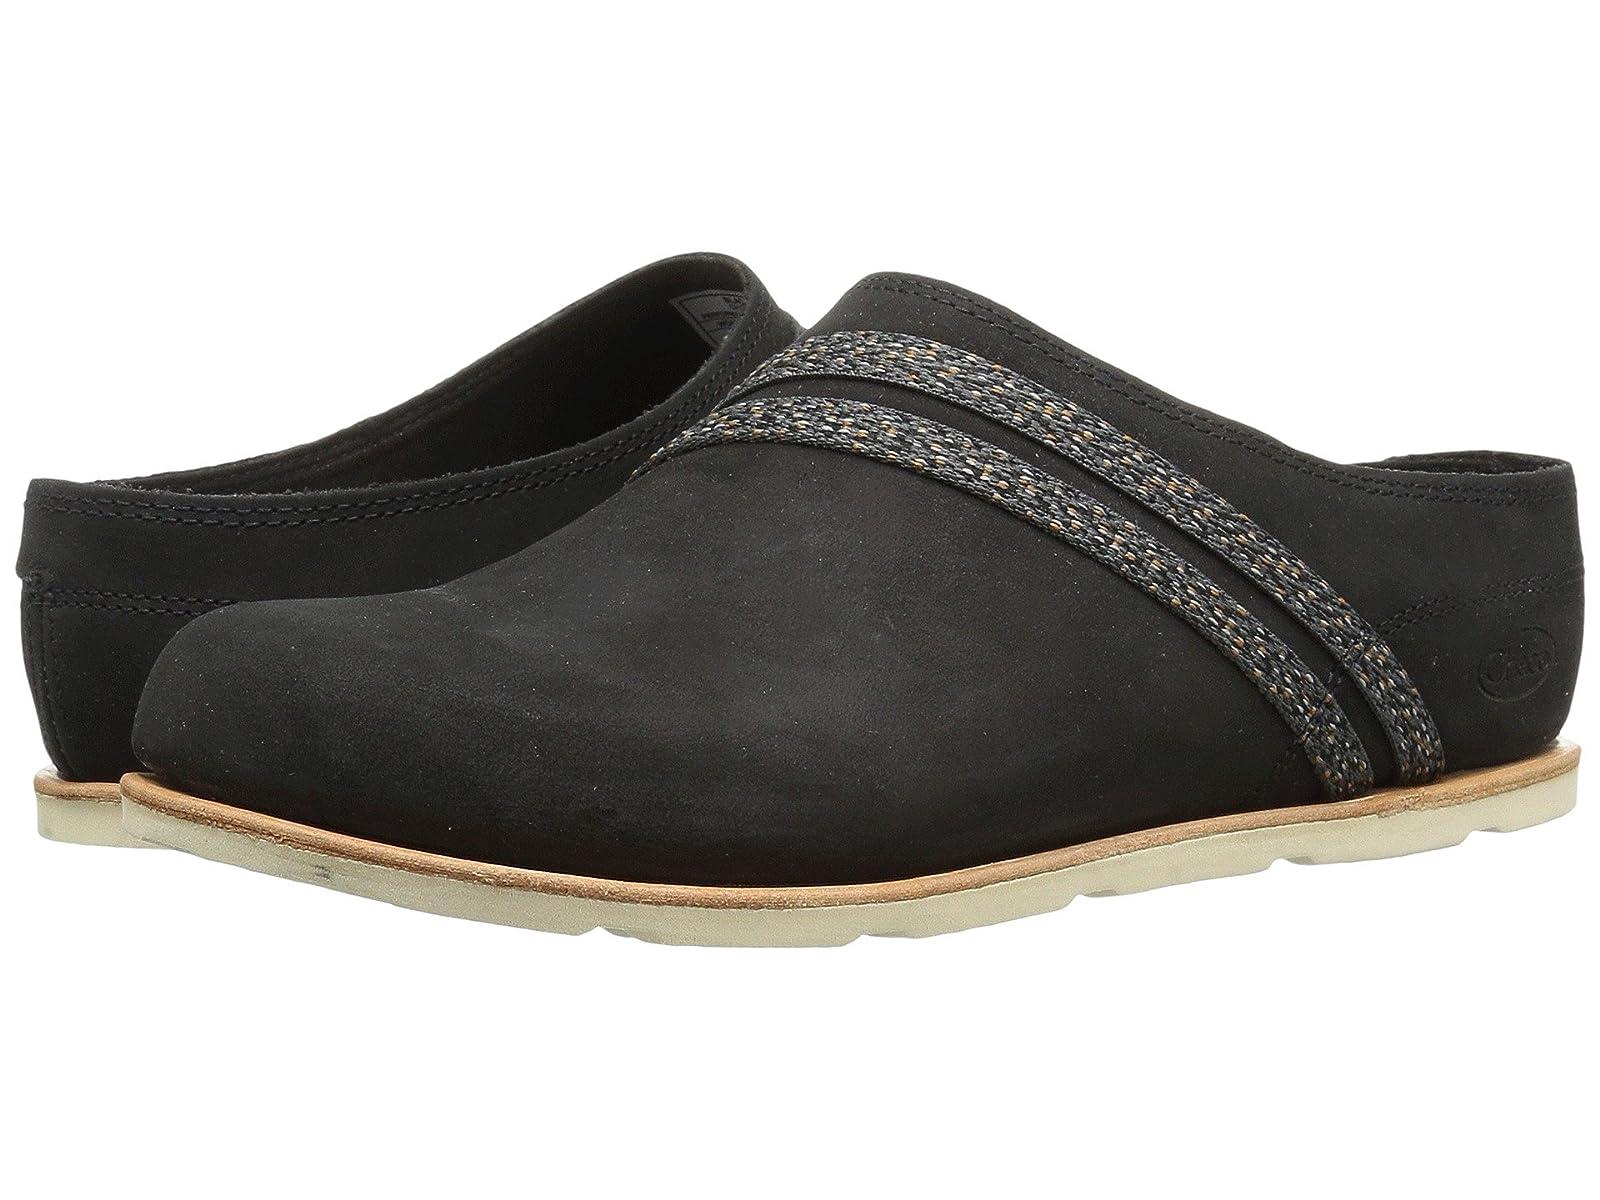 Chaco Harper SlideAtmospheric grades have affordable shoes